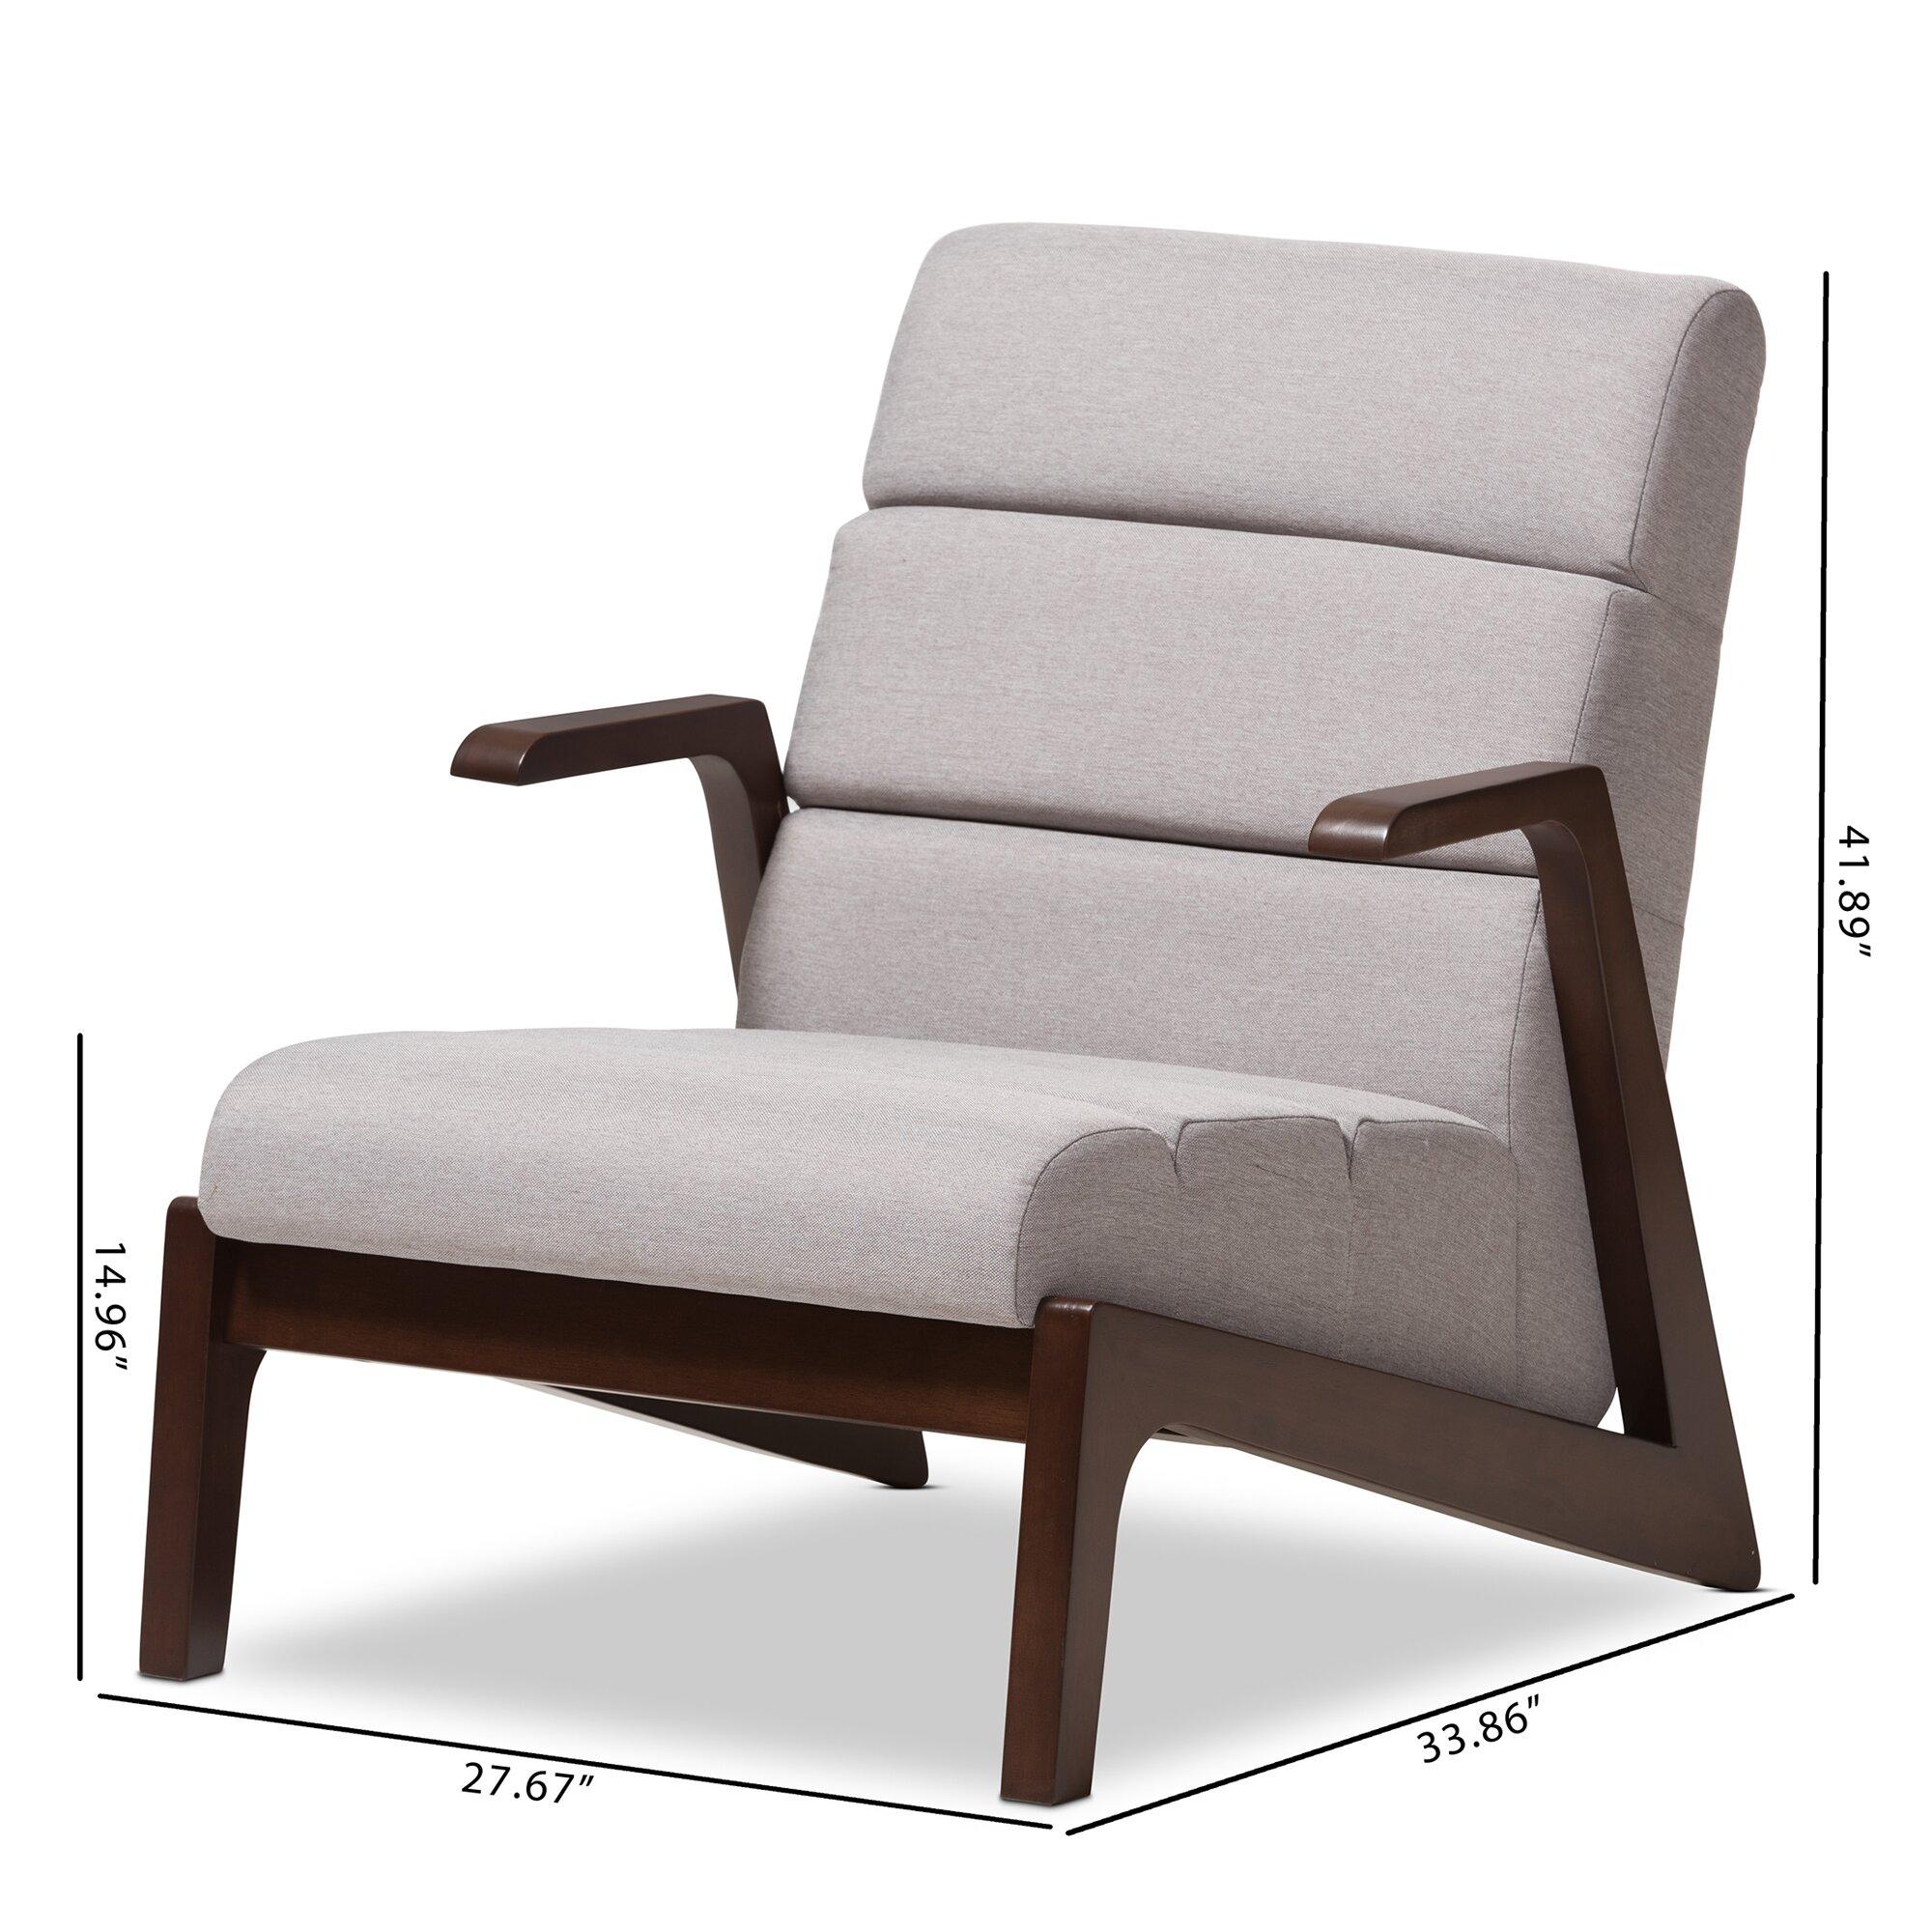 Mid Century Modern Lounge Chairs: Lazzaro Mid-Century Modern Lounge Chair And Ottoman